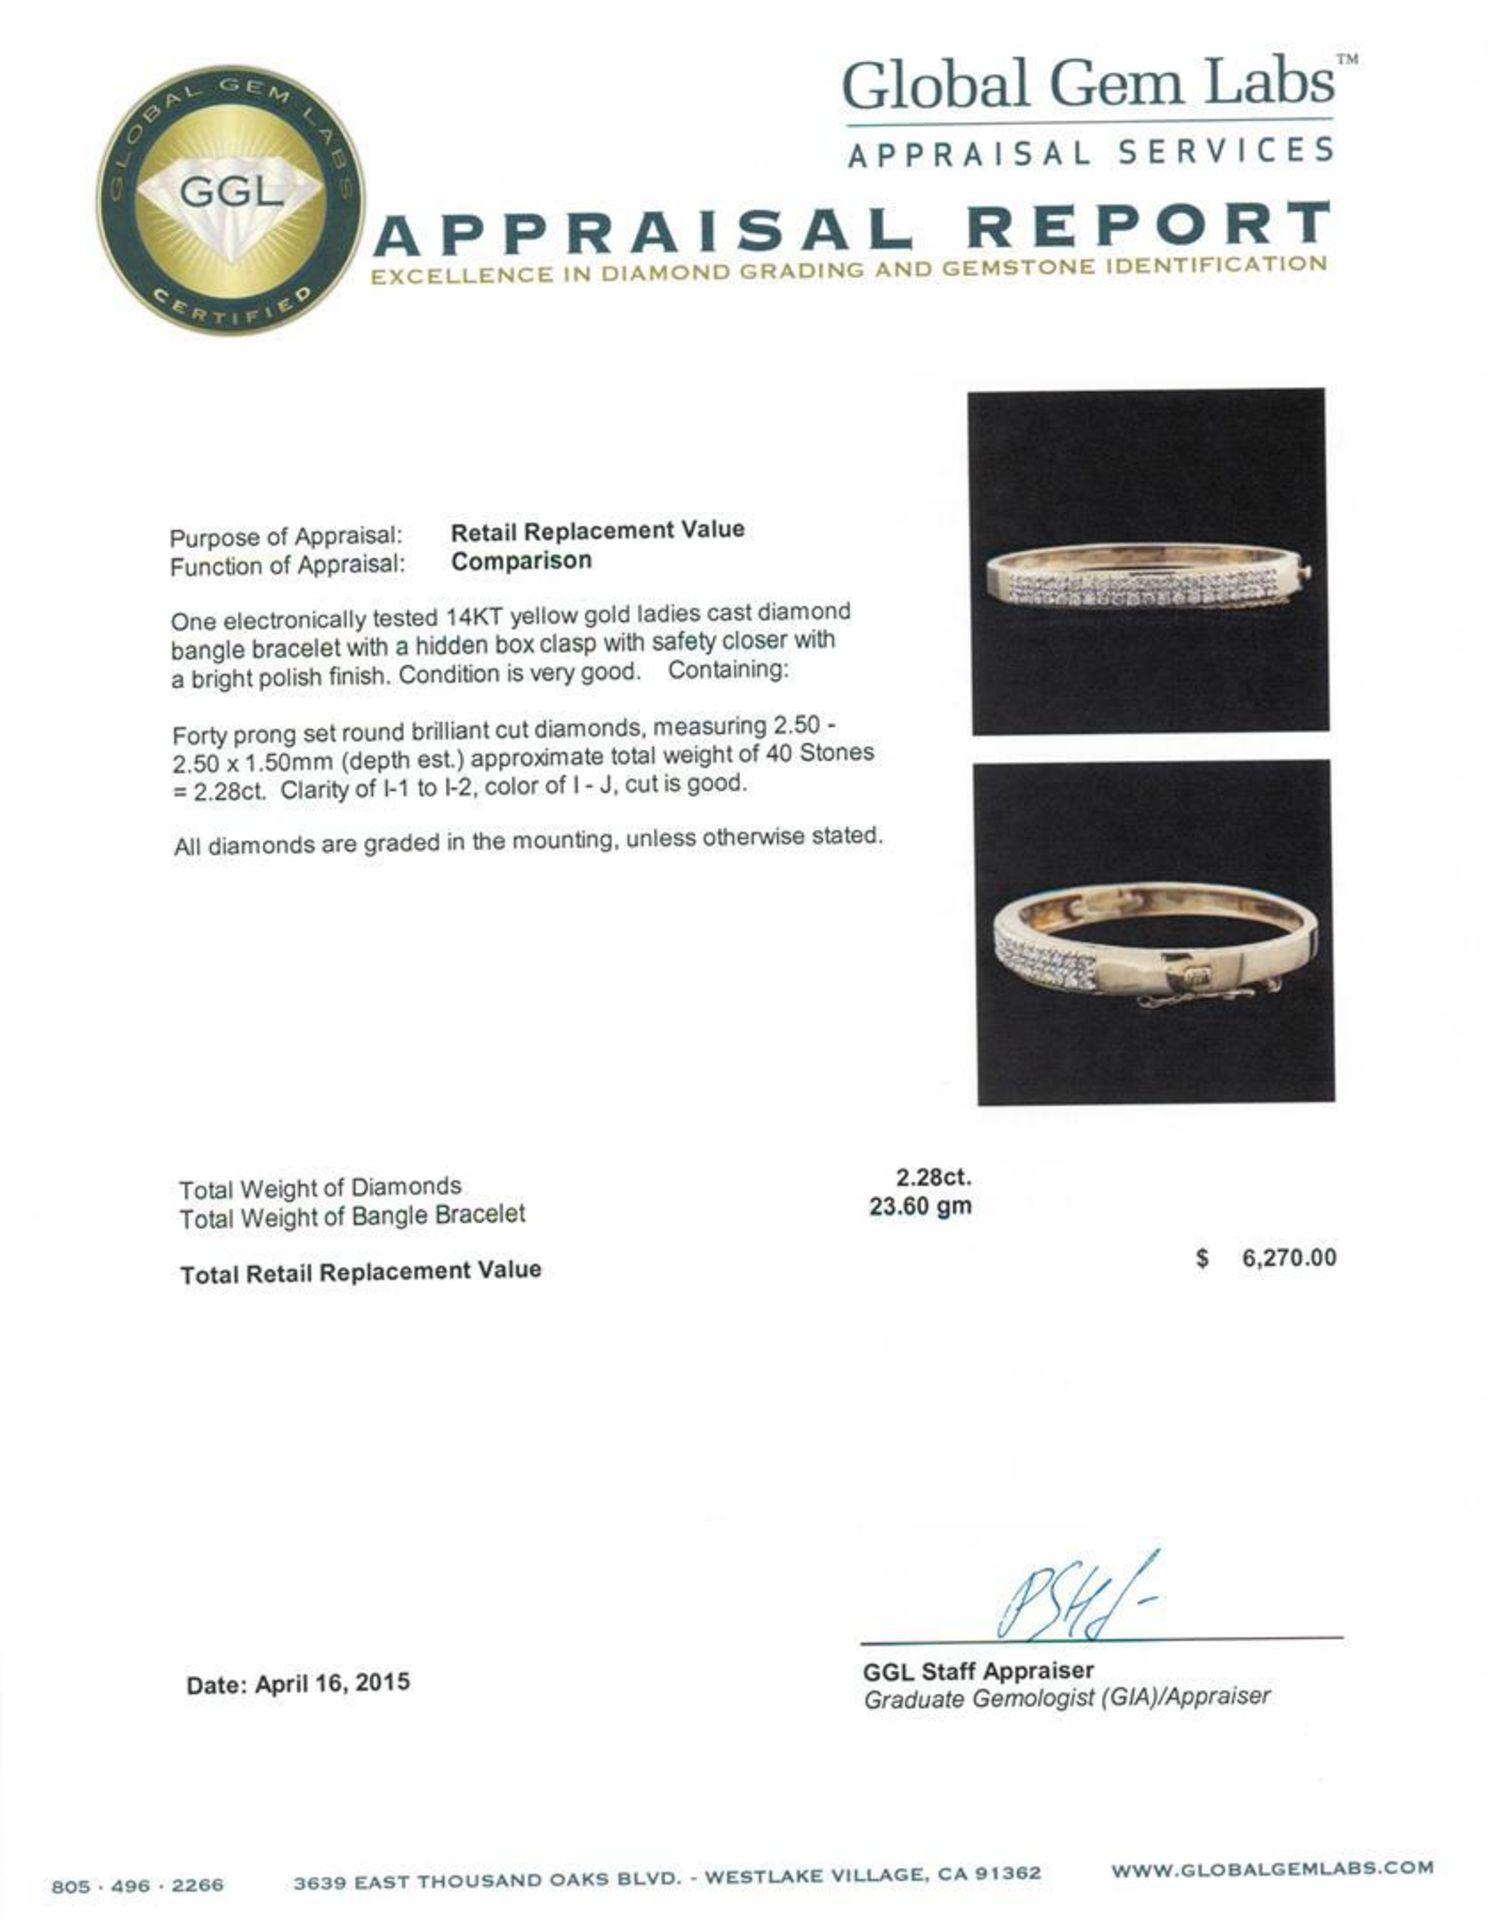 14KT Yellow Gold 2.28 ctw Diamond Bracelet - Image 4 of 4